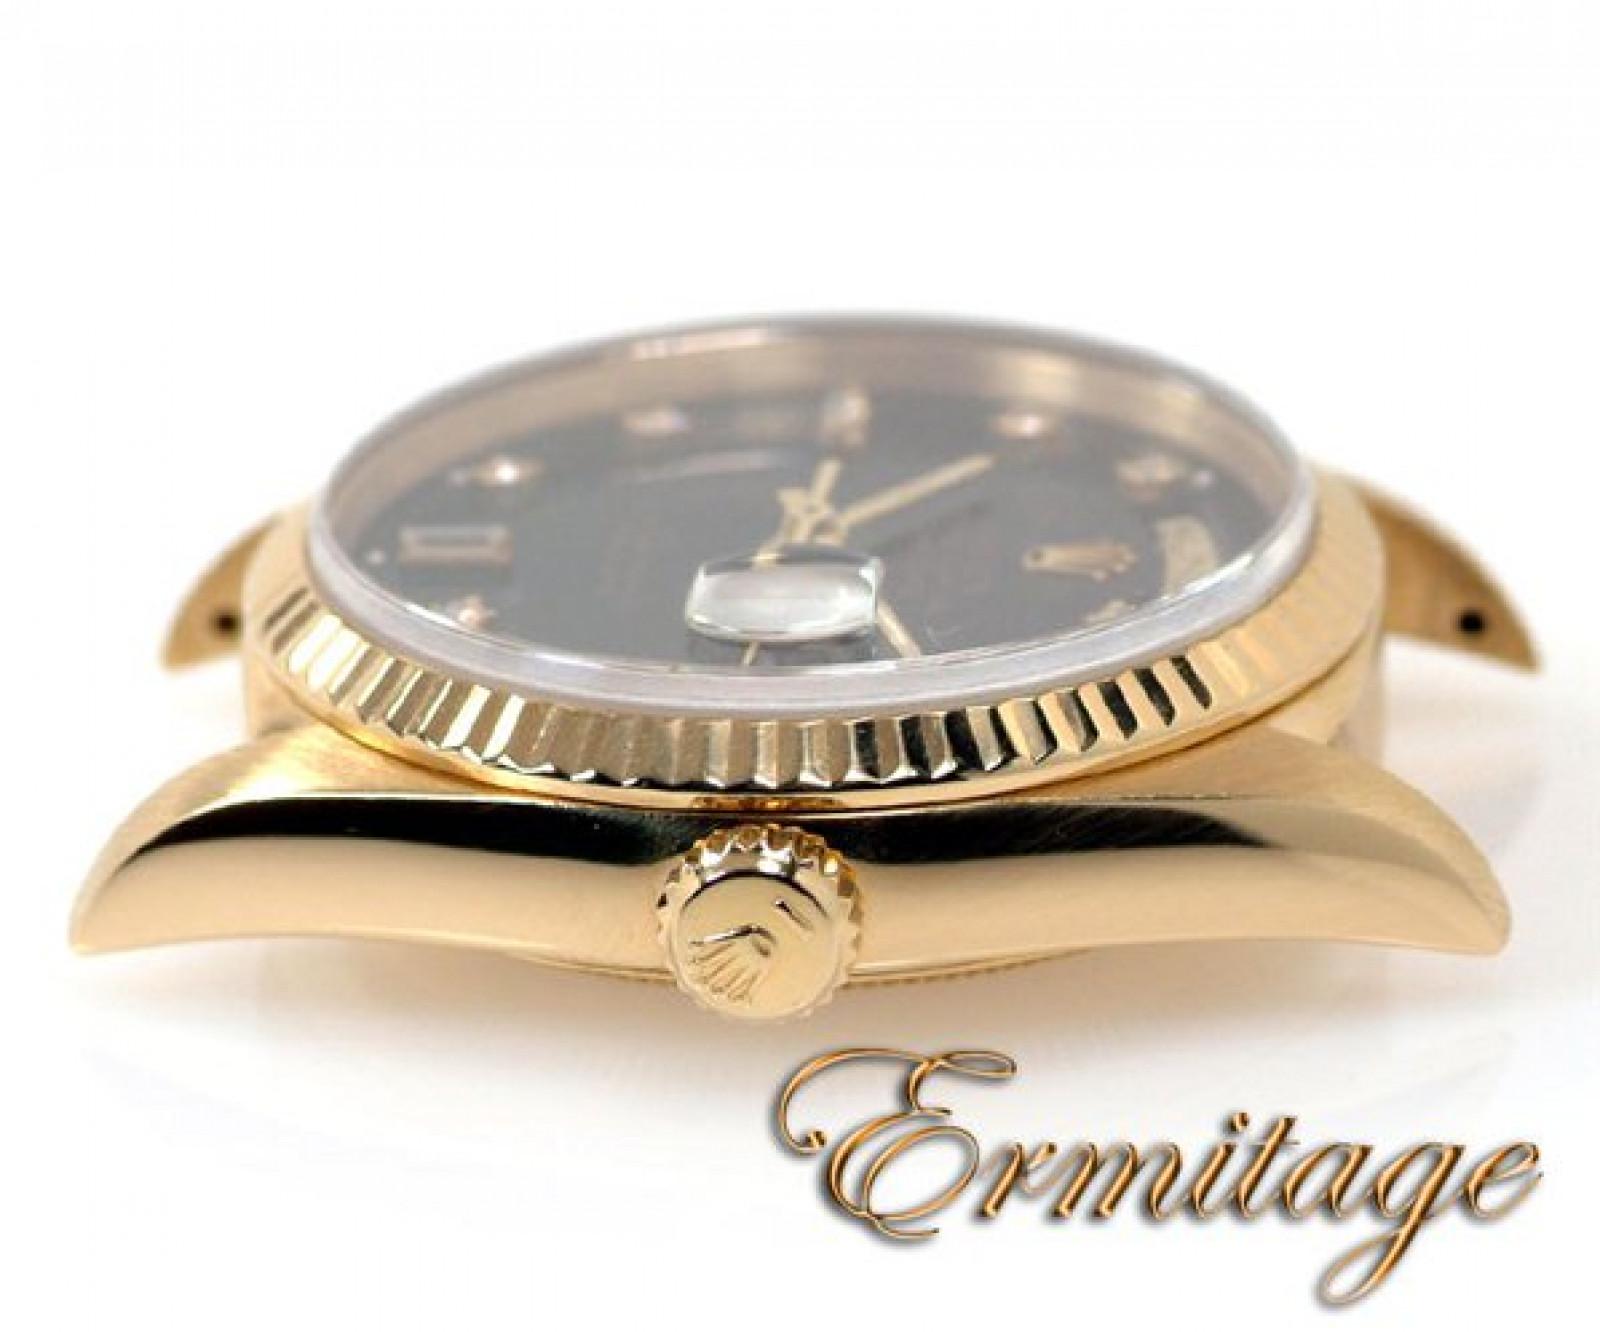 Diamond Rolex Day-Date 18238 President